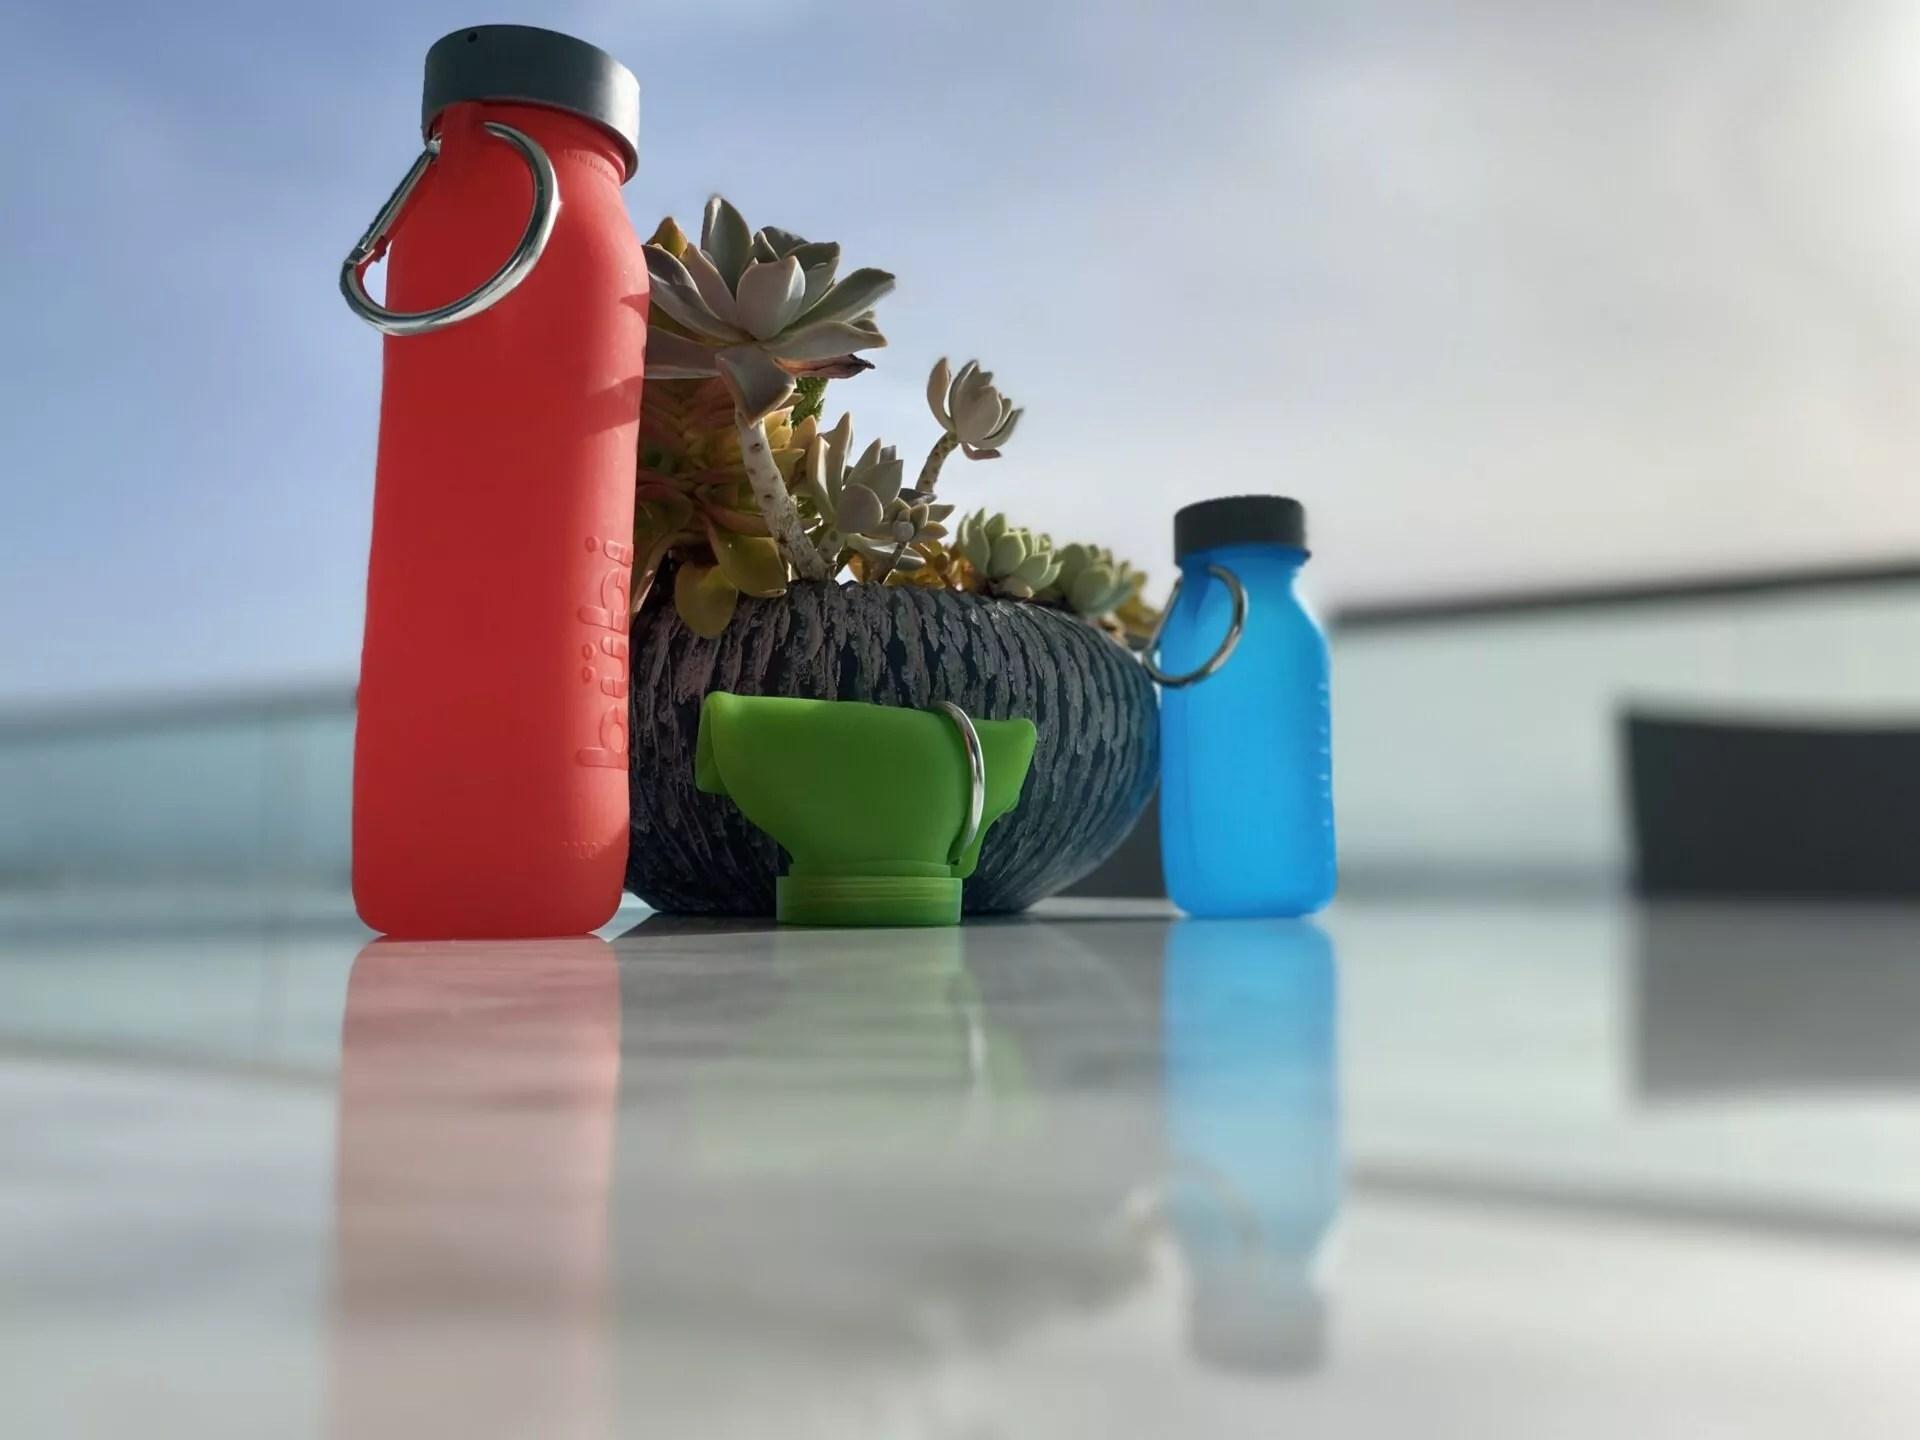 Silicone bottles, lifestyle, eco-friendly